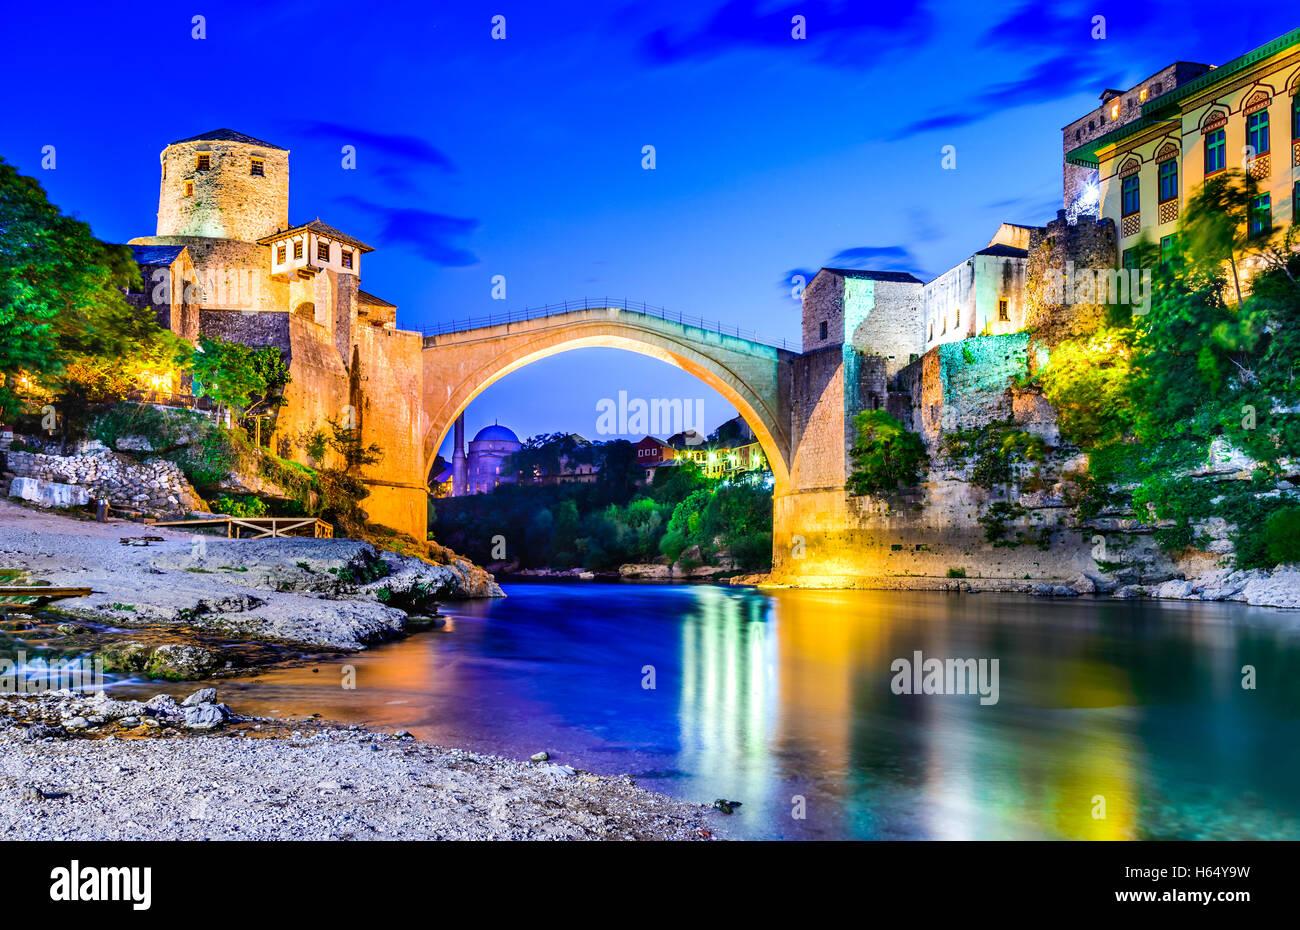 Mostar, Bosnia and Herzegovina. The Old Bridge, Stari Most, with emerald river Neretva. - Stock Image